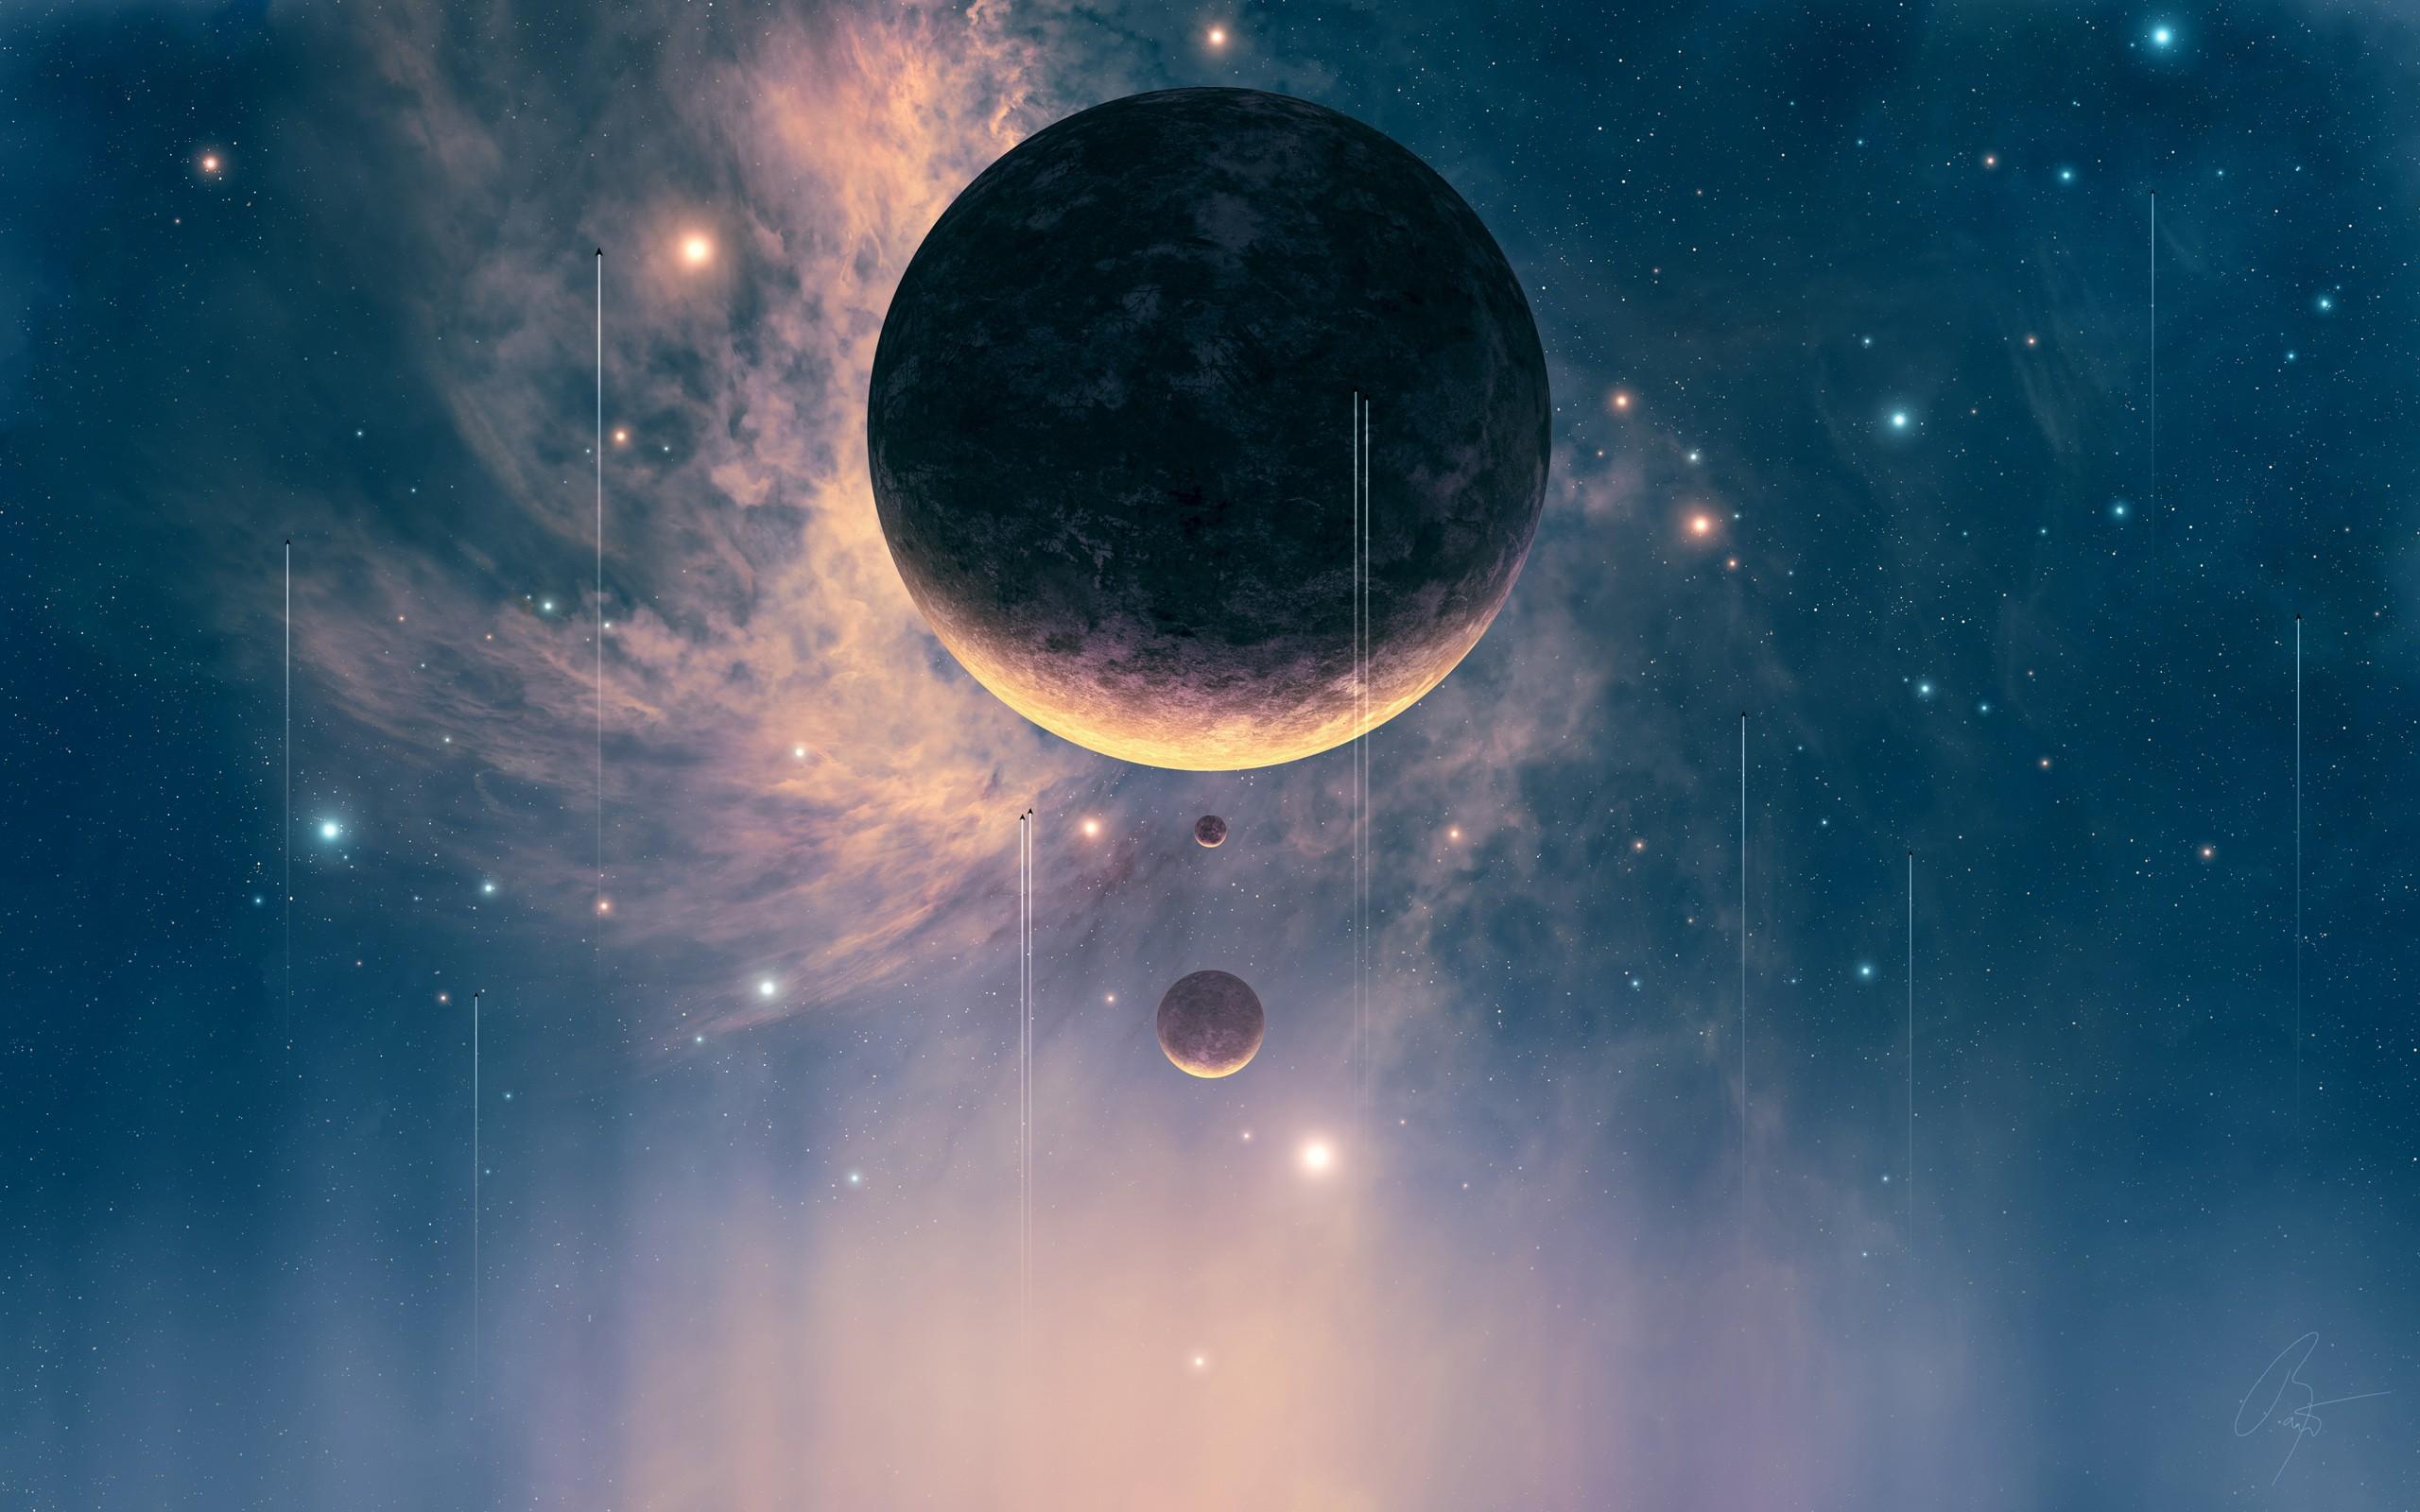 General 2560x1600 universe falling planet digital art space space art science fiction futuristic artwork JoeyJazz